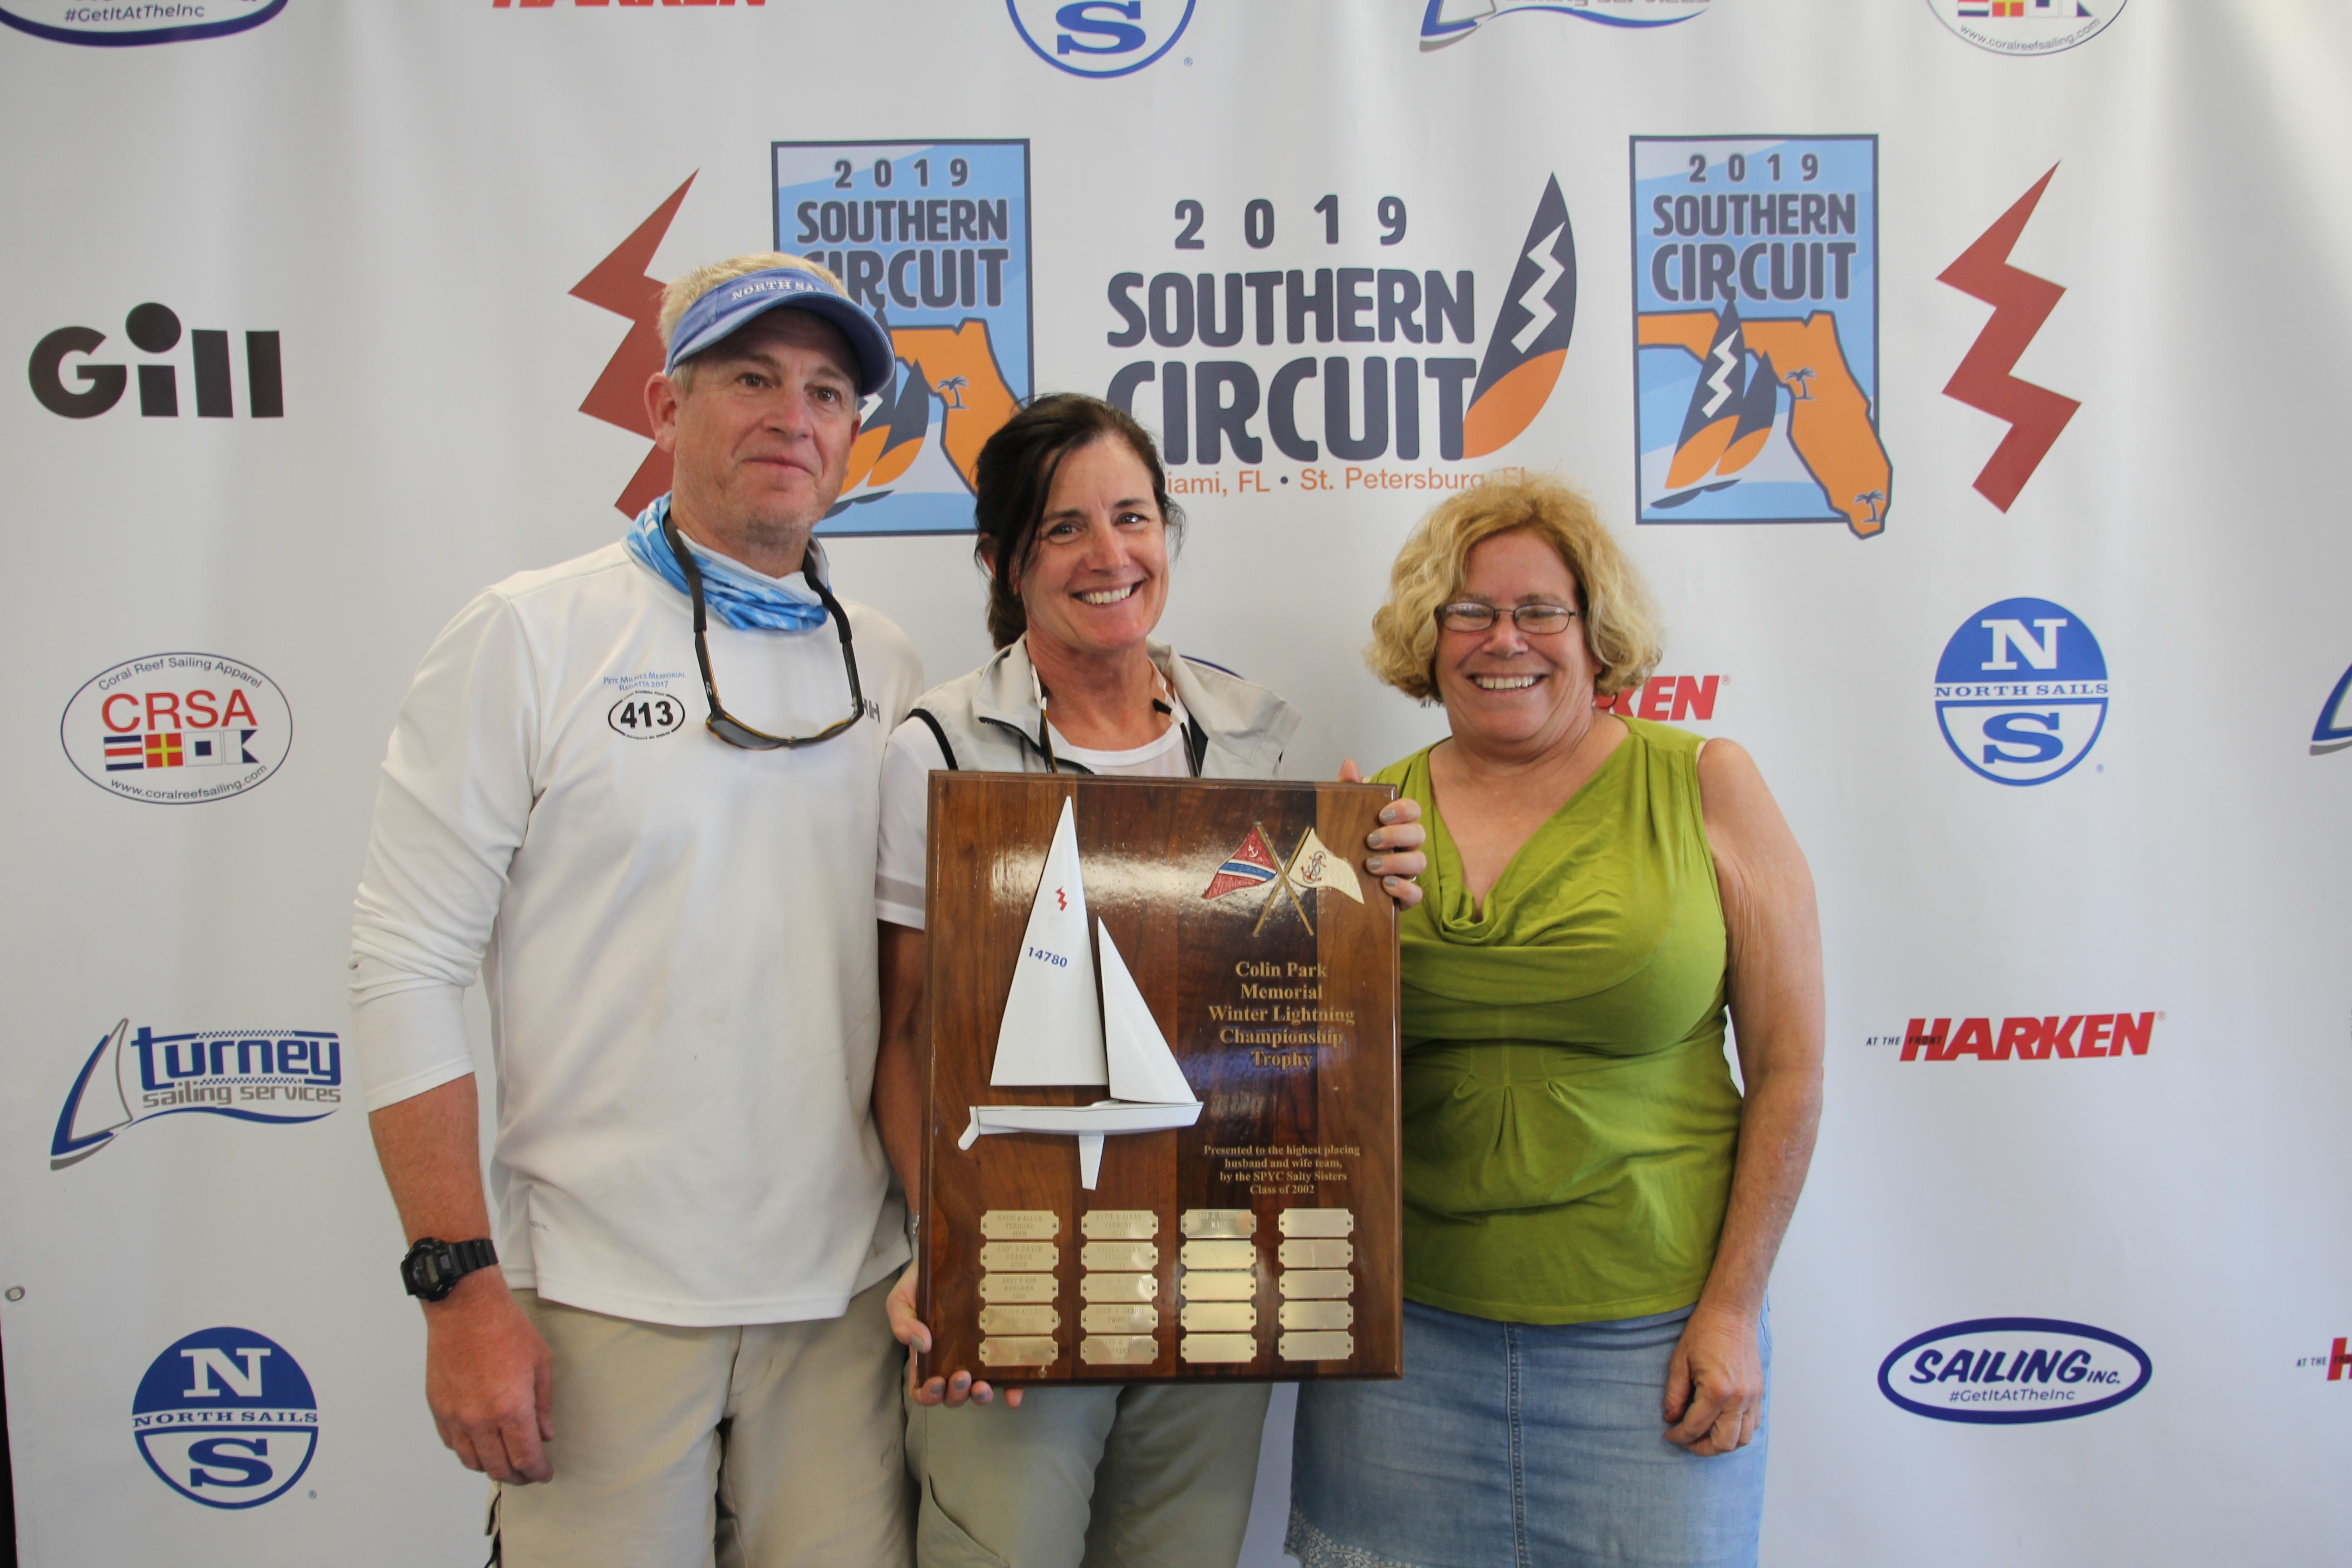 Kirkpatrick_Colin Park Trophy